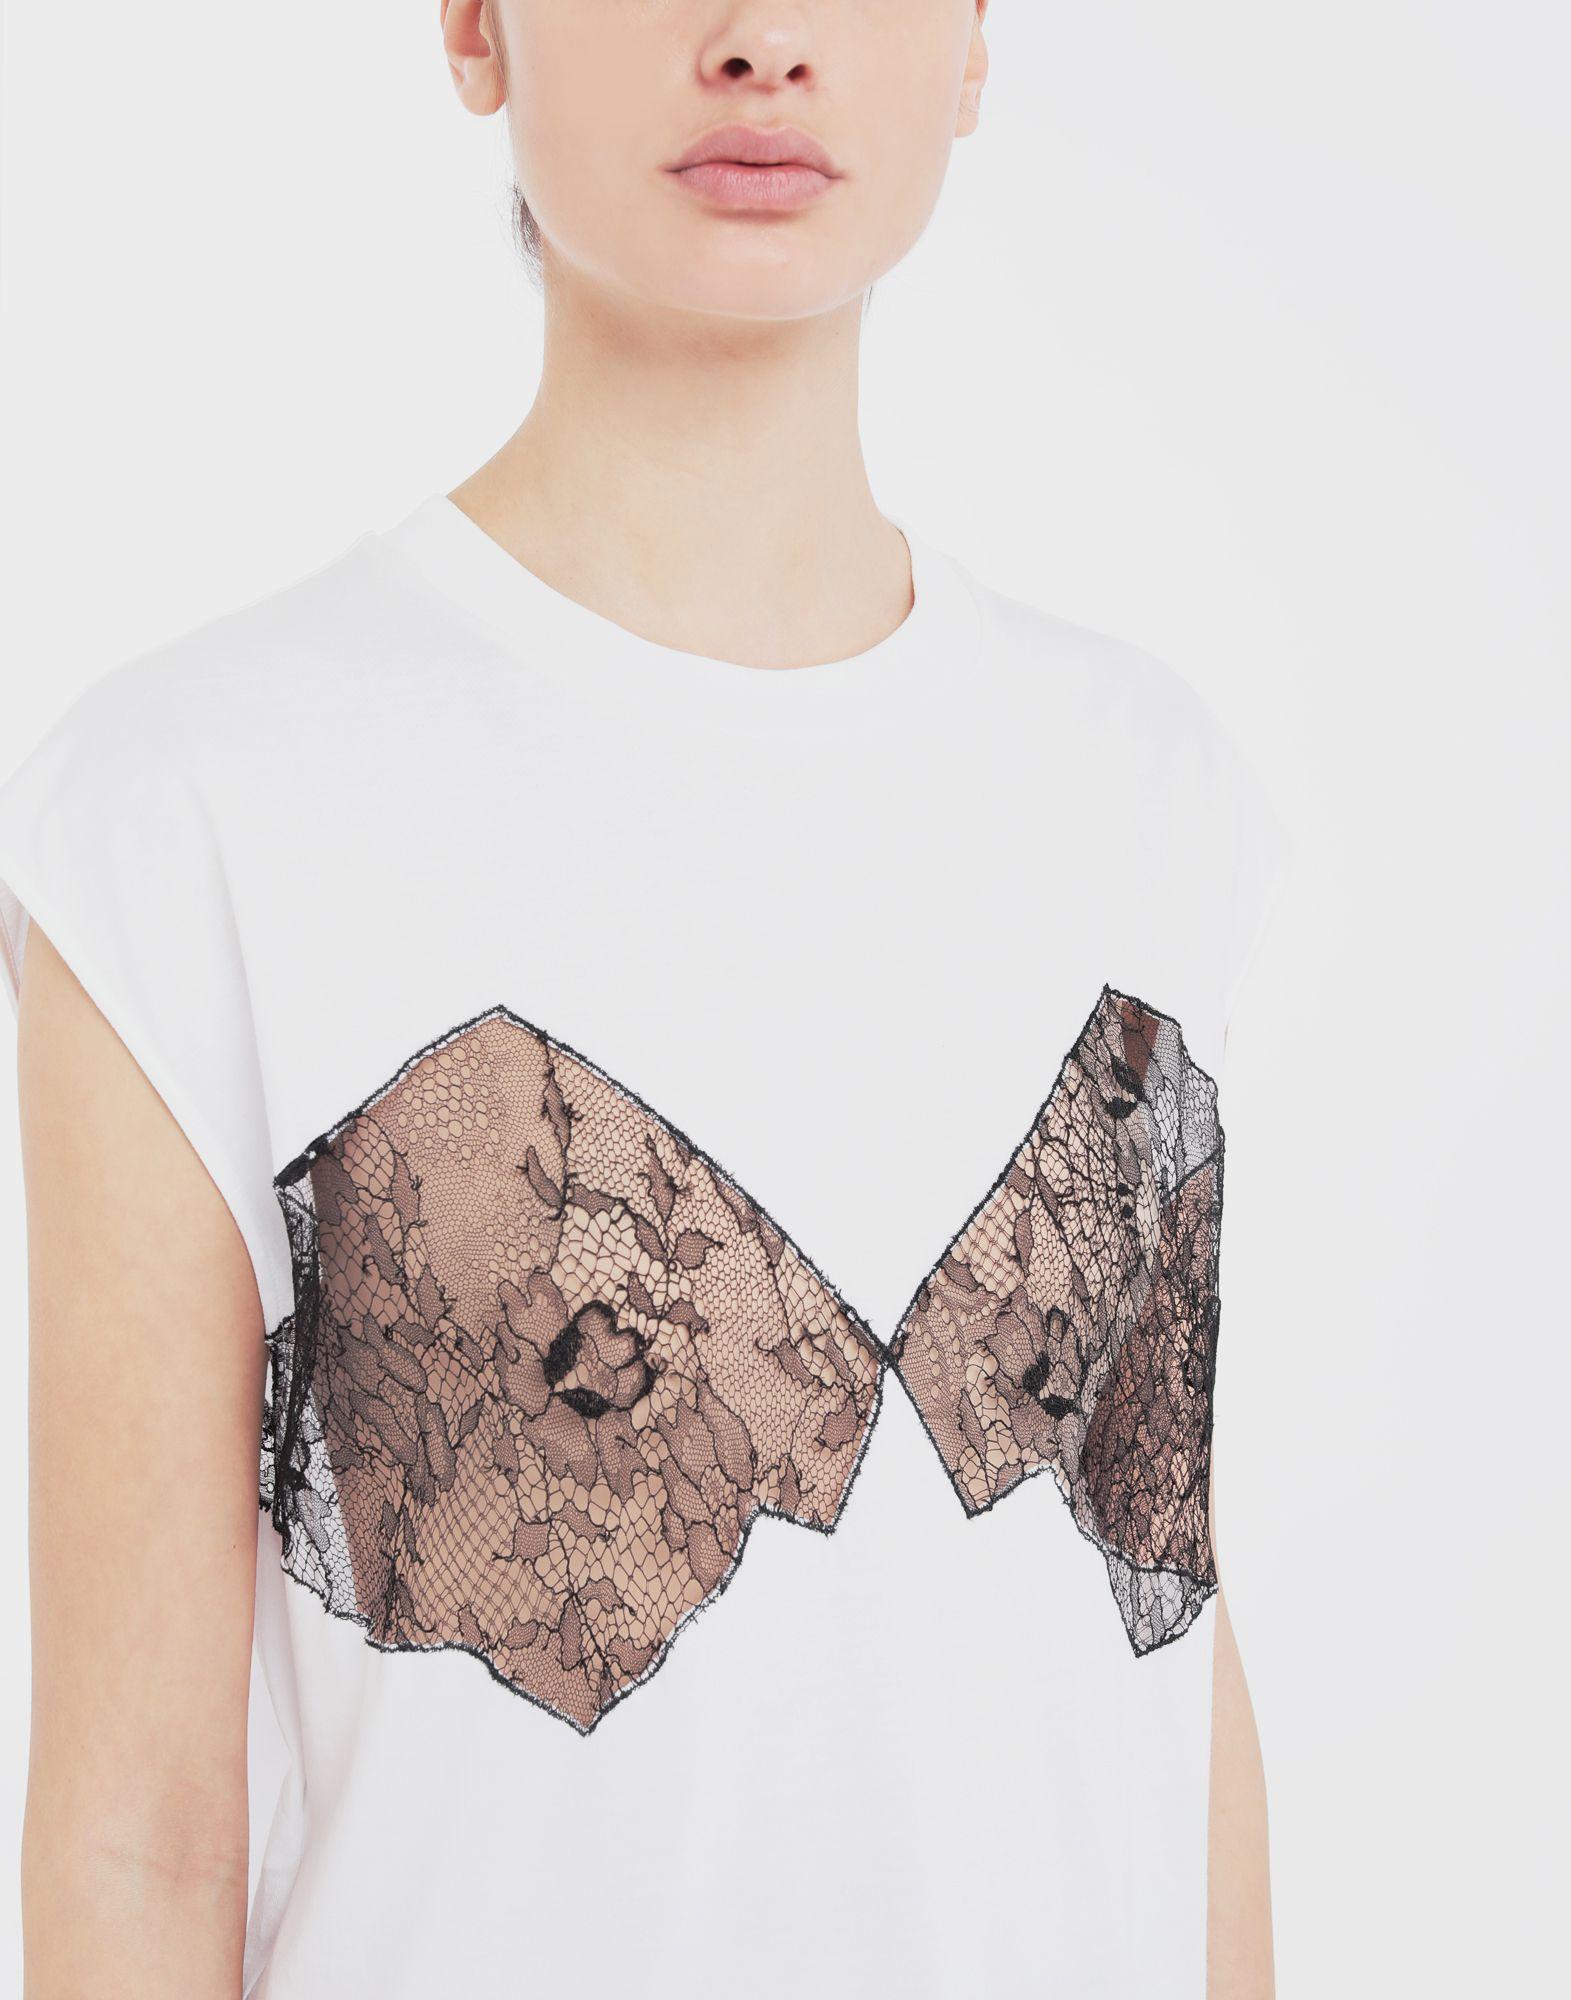 MAISON MARGIELA Lace-panelled jersey T-shirt Top Woman a